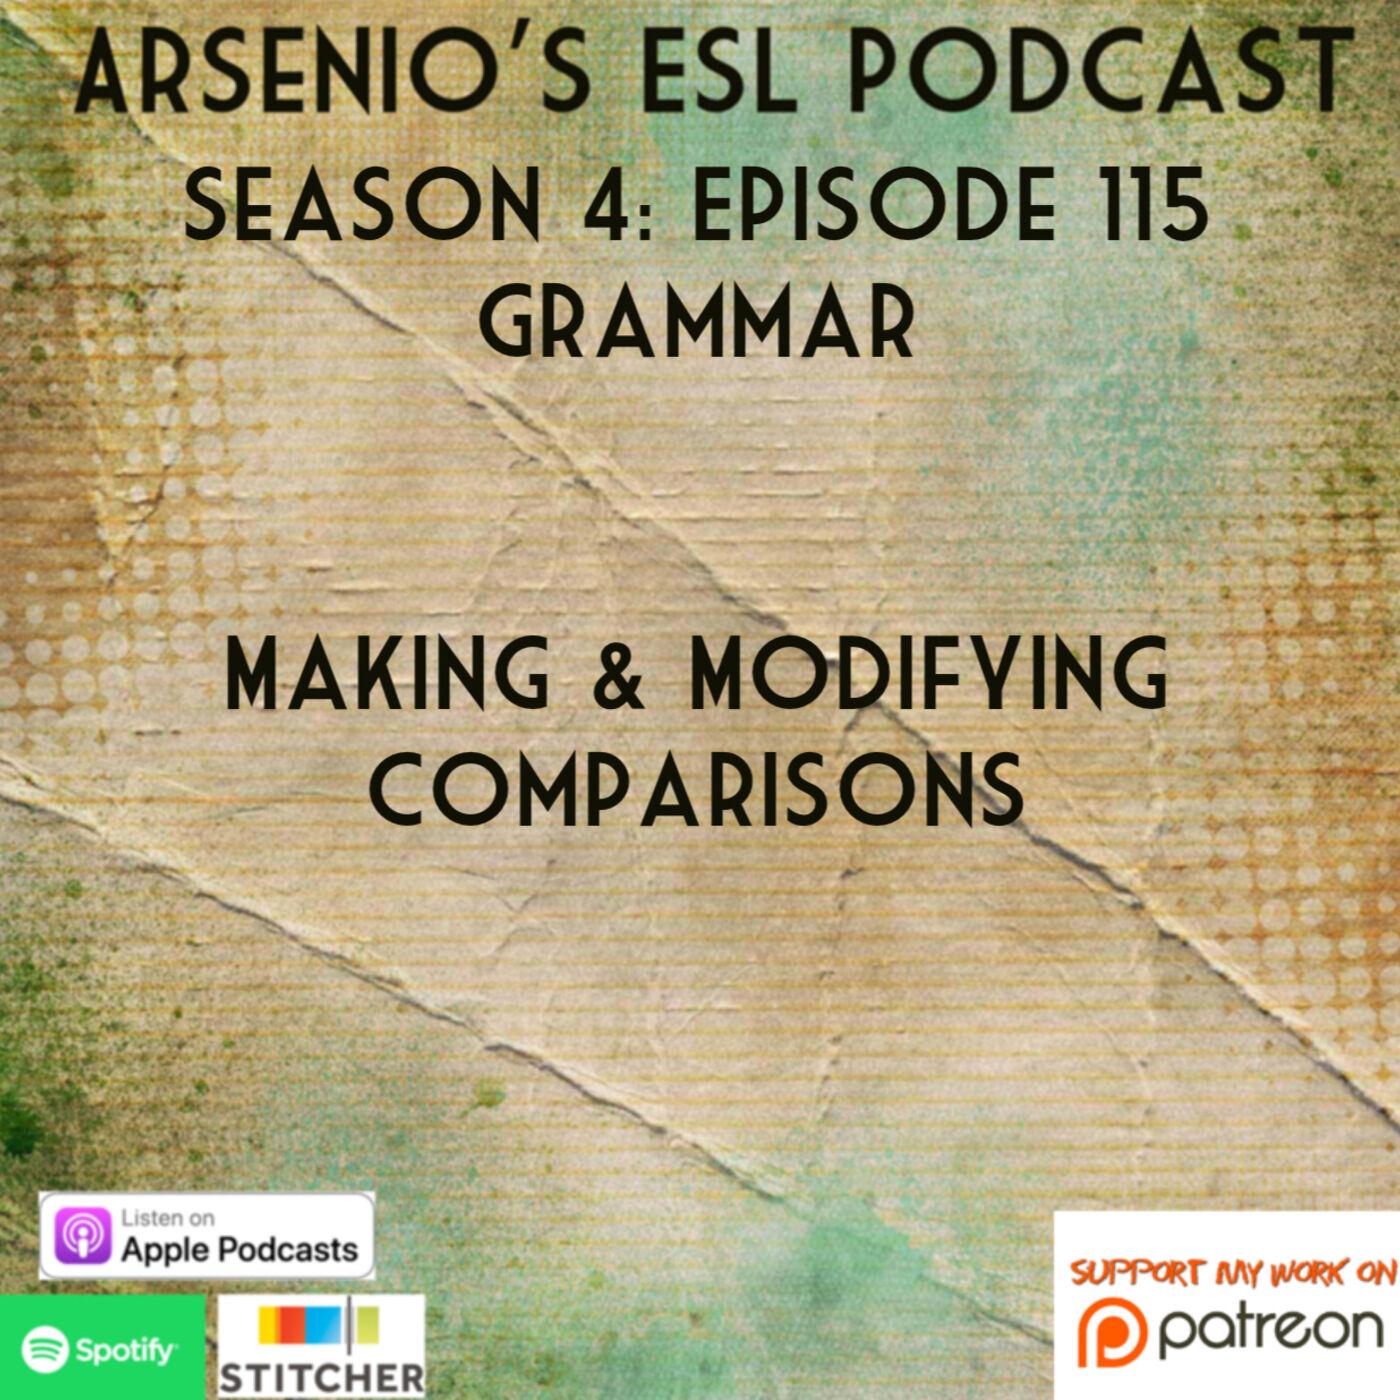 Arsenio's ESL Podcast: Season 4 - Episode 115 - Grammar - Making & Modifying Comparisons